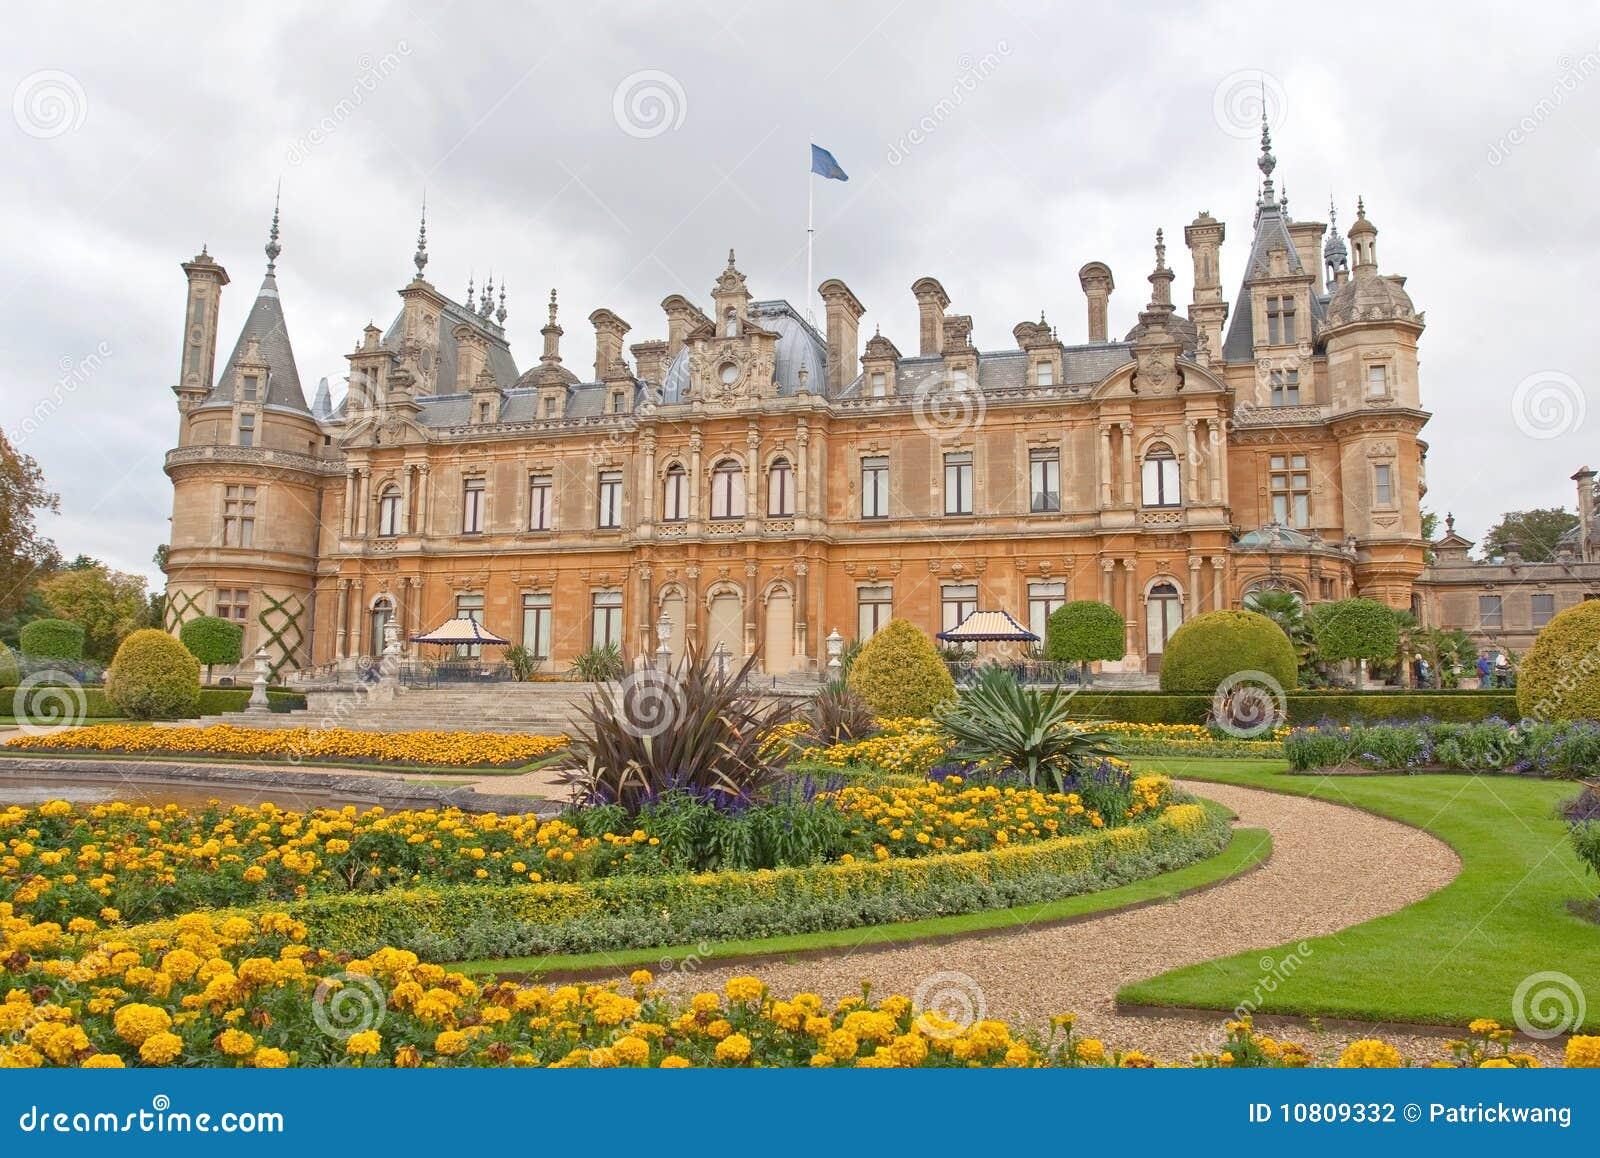 Manoir Et Jardin De Waddesdon En Angleterre Photo Stock